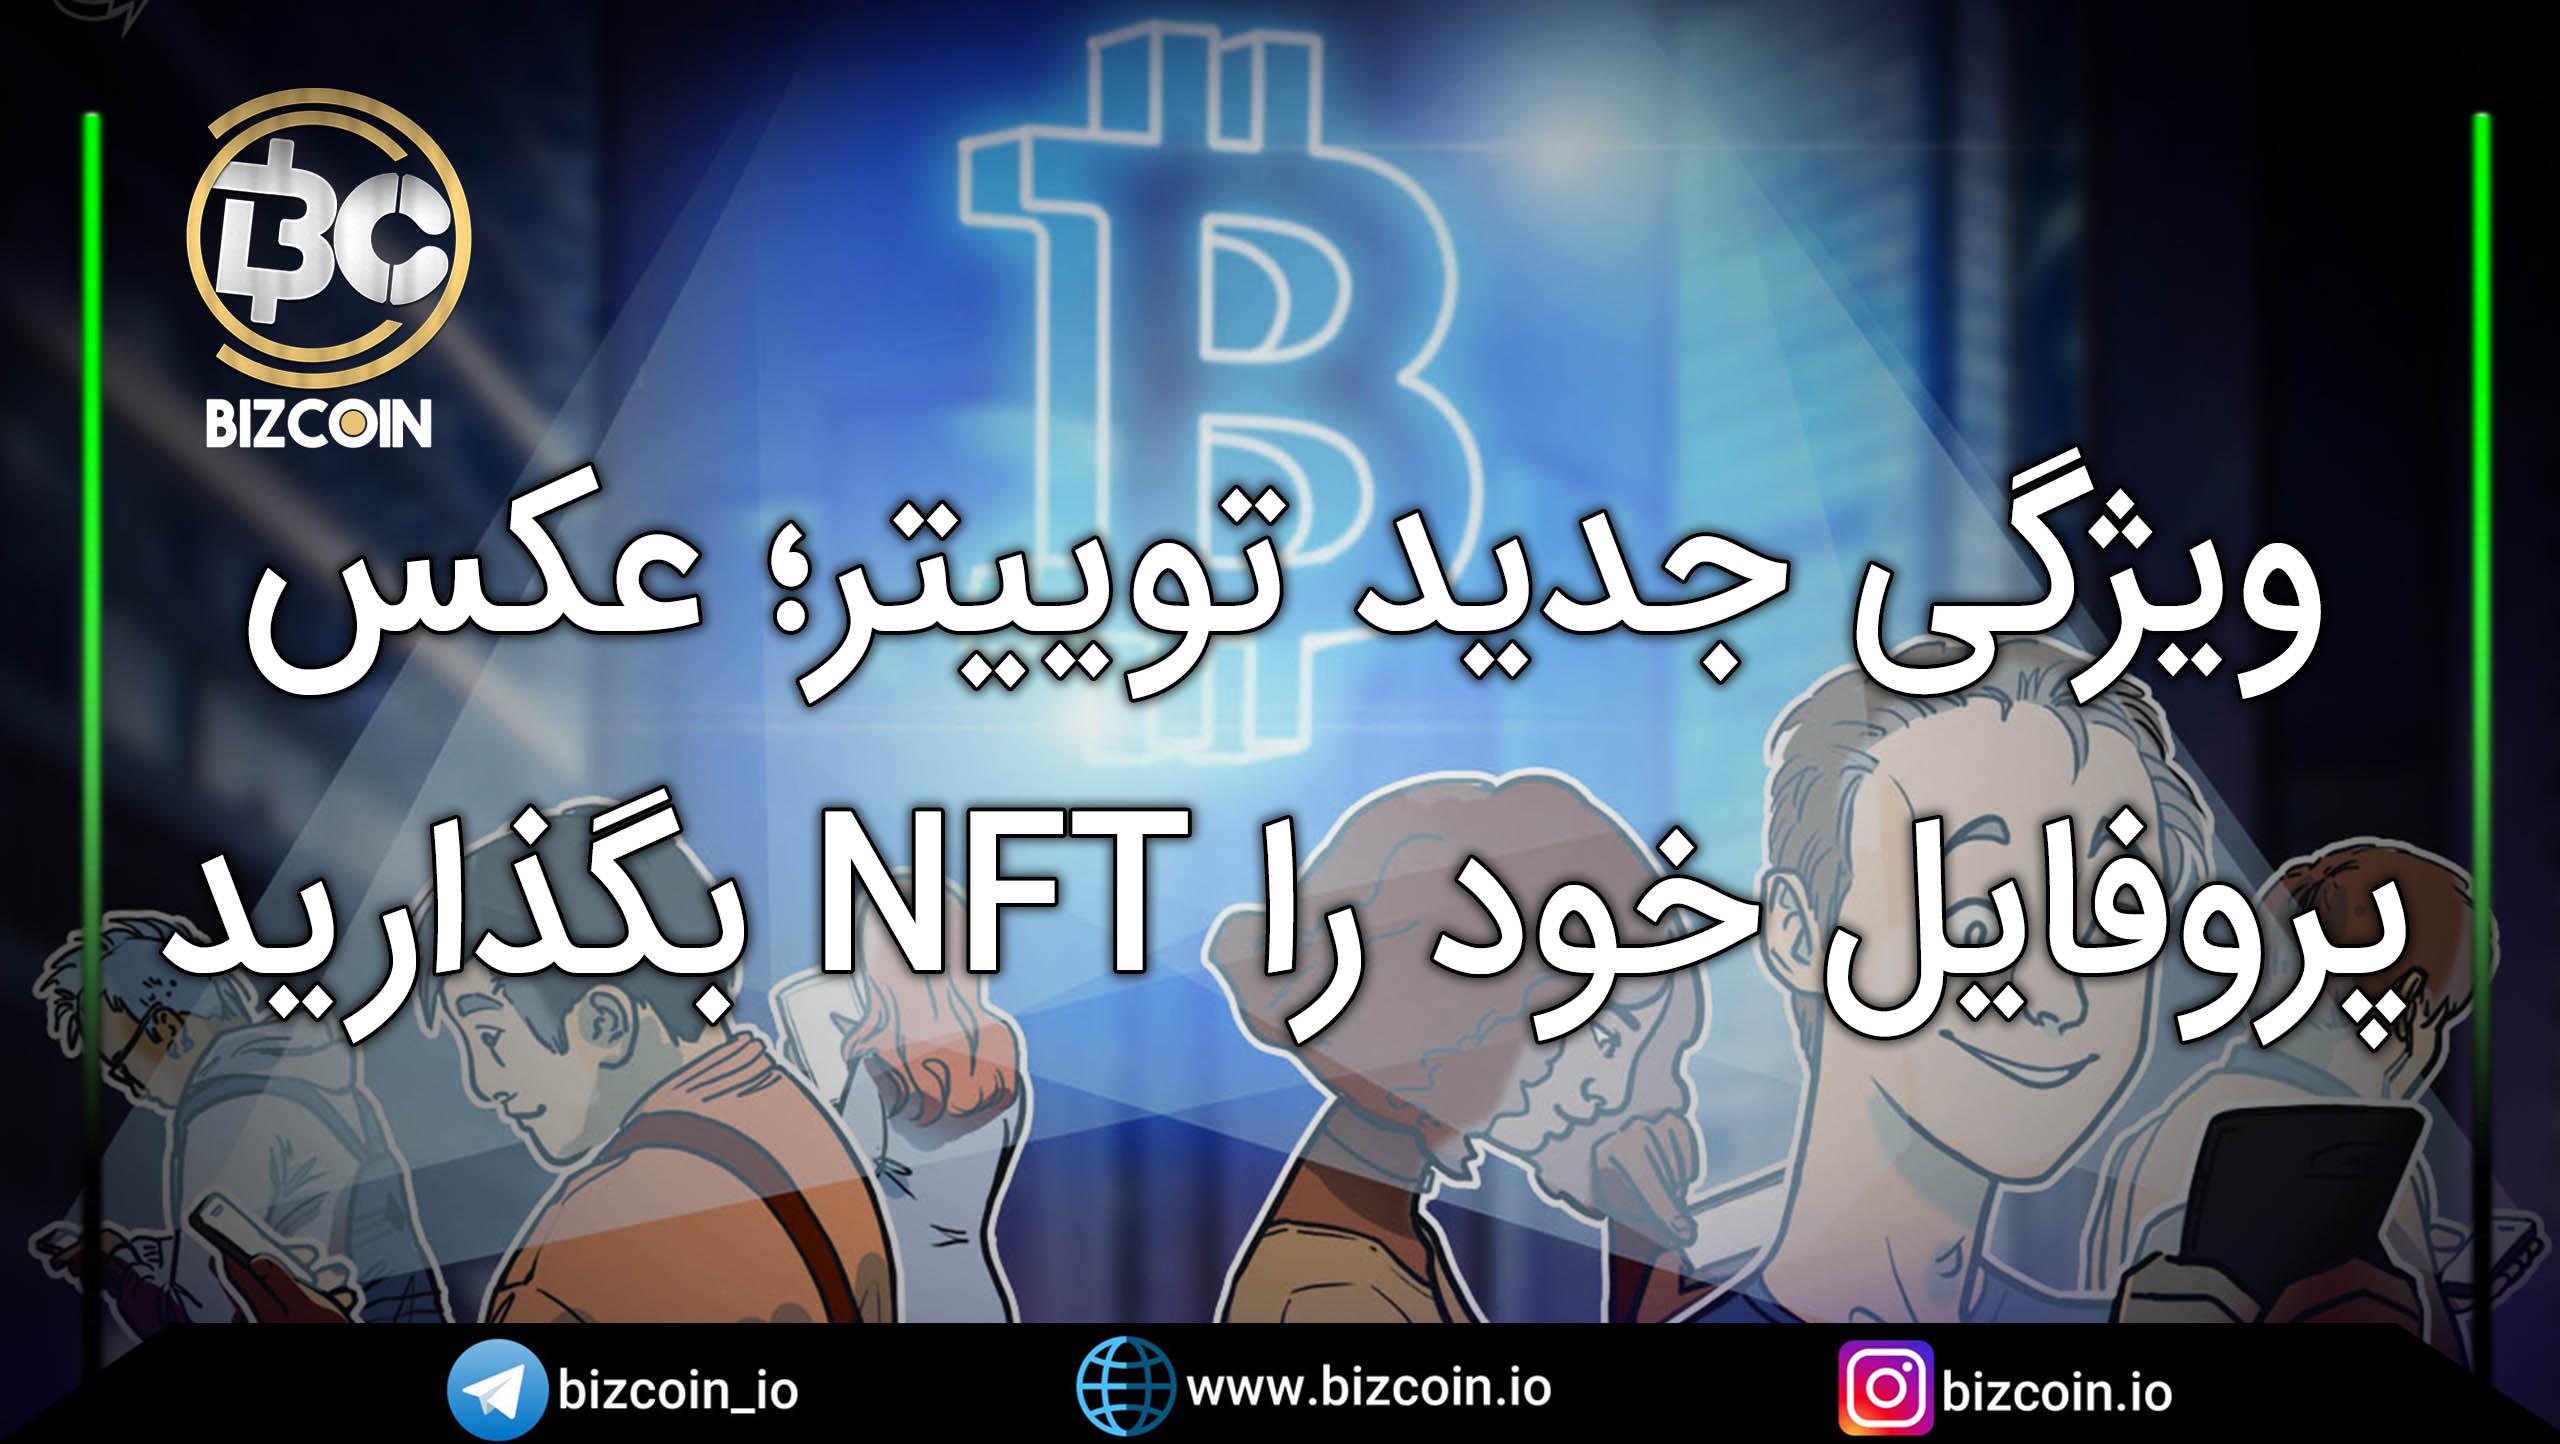 New Twitter feature NFT your profile picture 1 ویژگی جدید توییتر؛ عکس پروفایل خود را NFT بگذارید